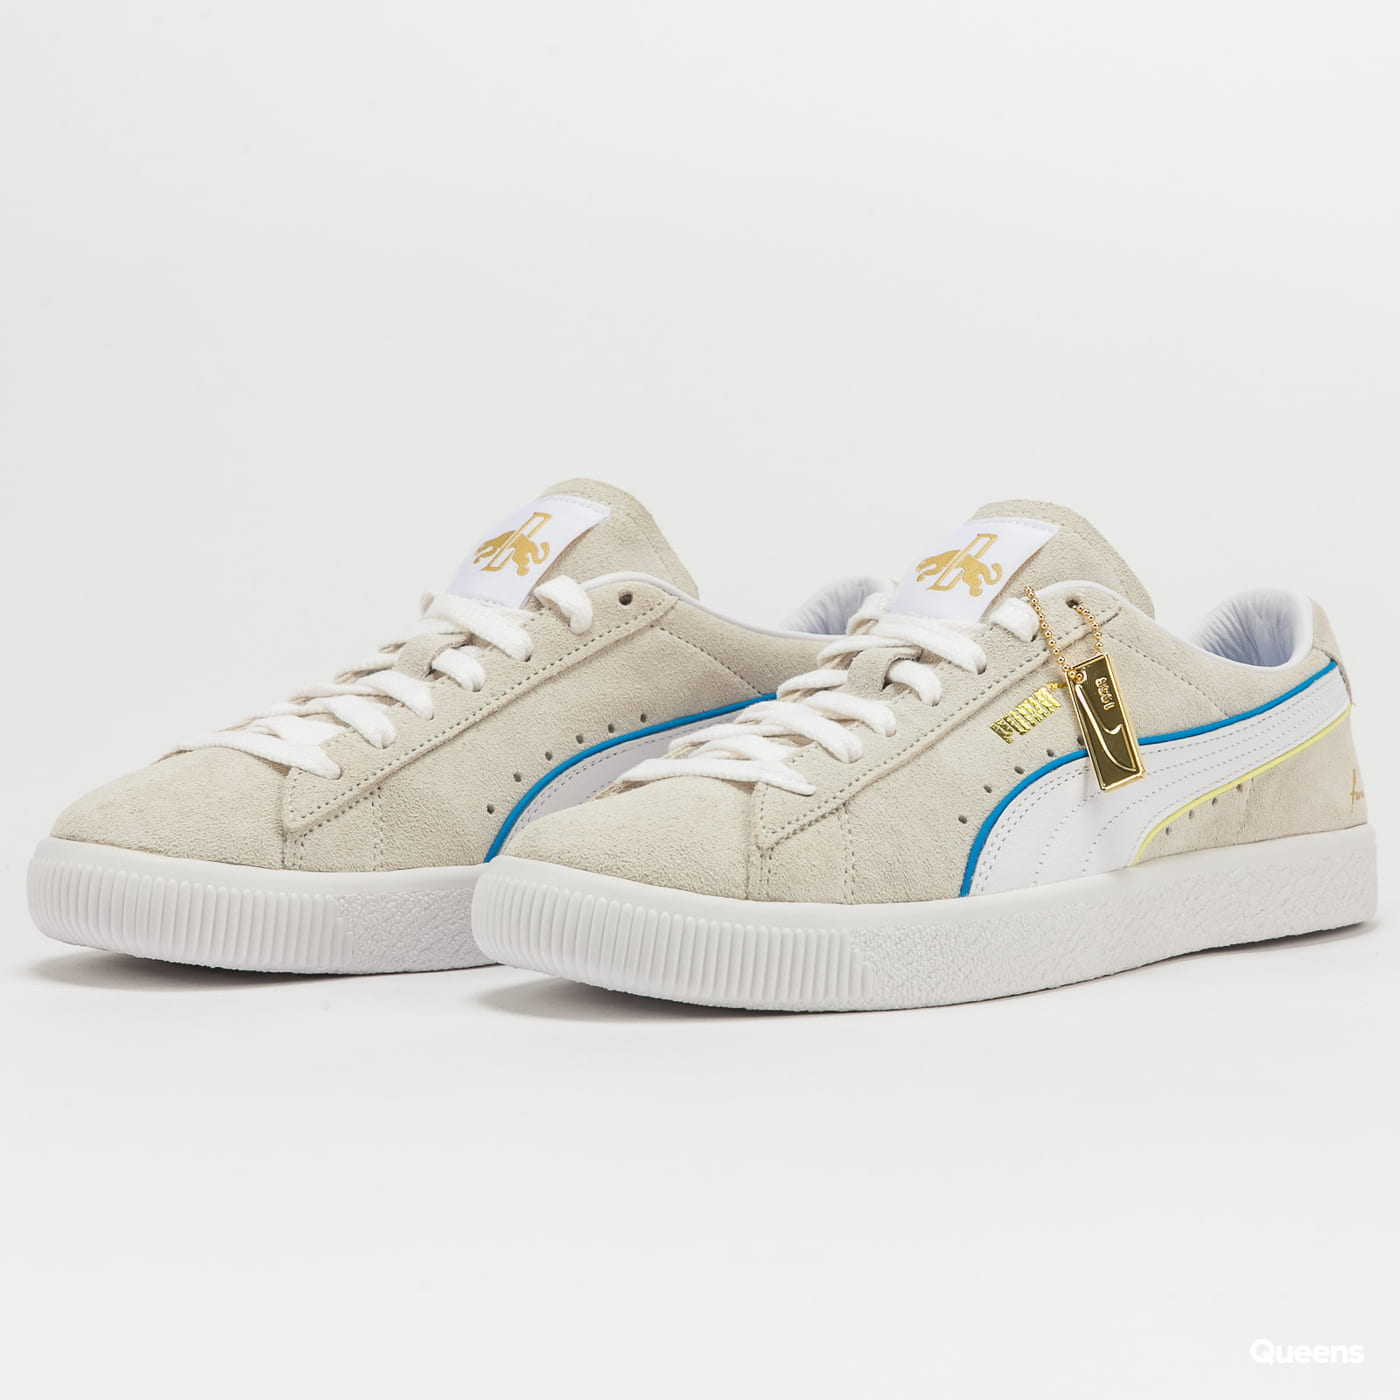 Puma Suede VTG RDL FS vap gray - puma white - ibiza blue